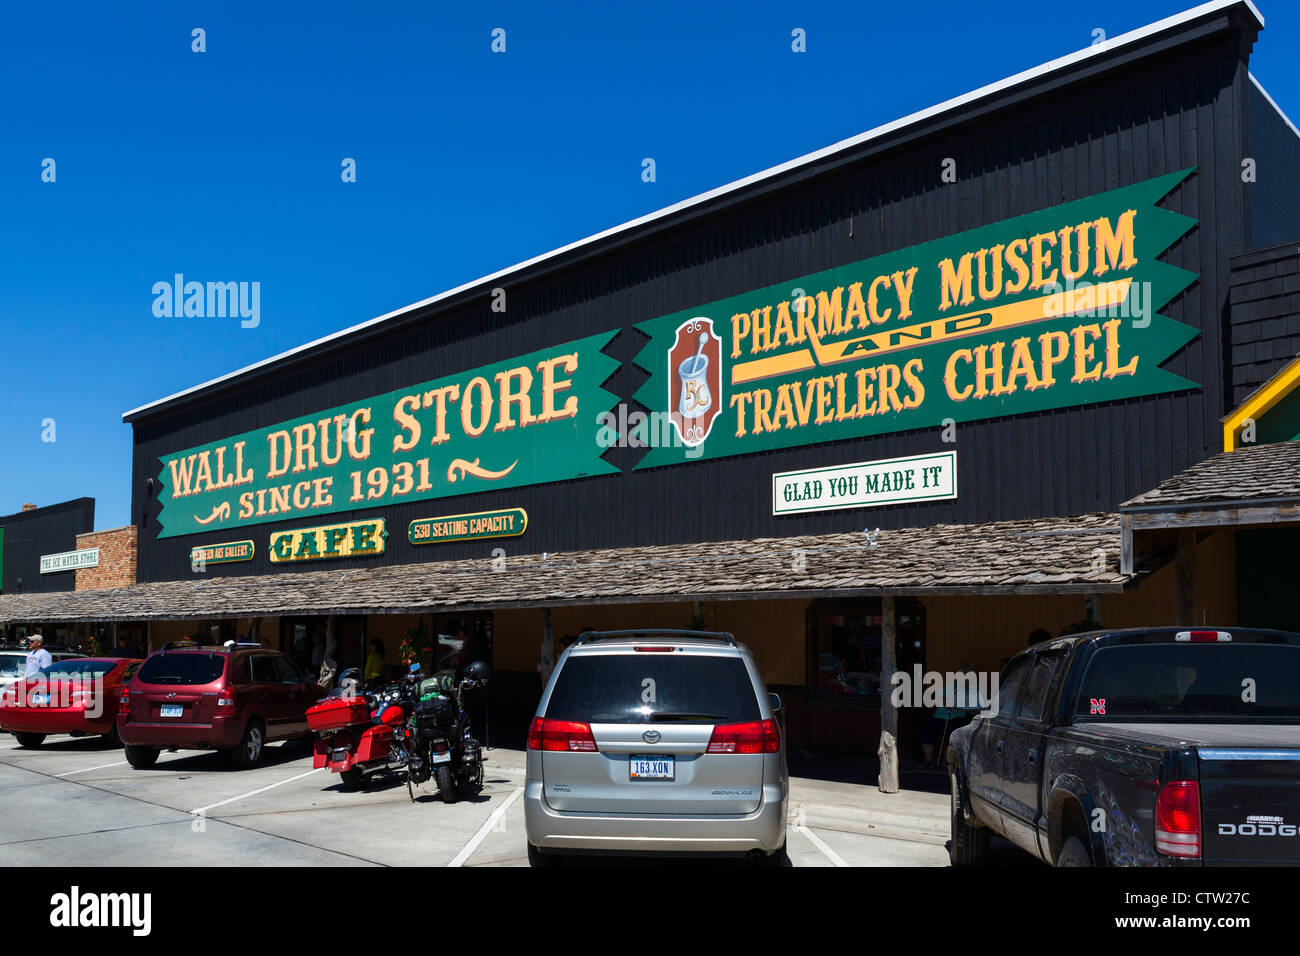 Le célèbre Wall Drug Store au mur, South Dakota, USA Photo Stock